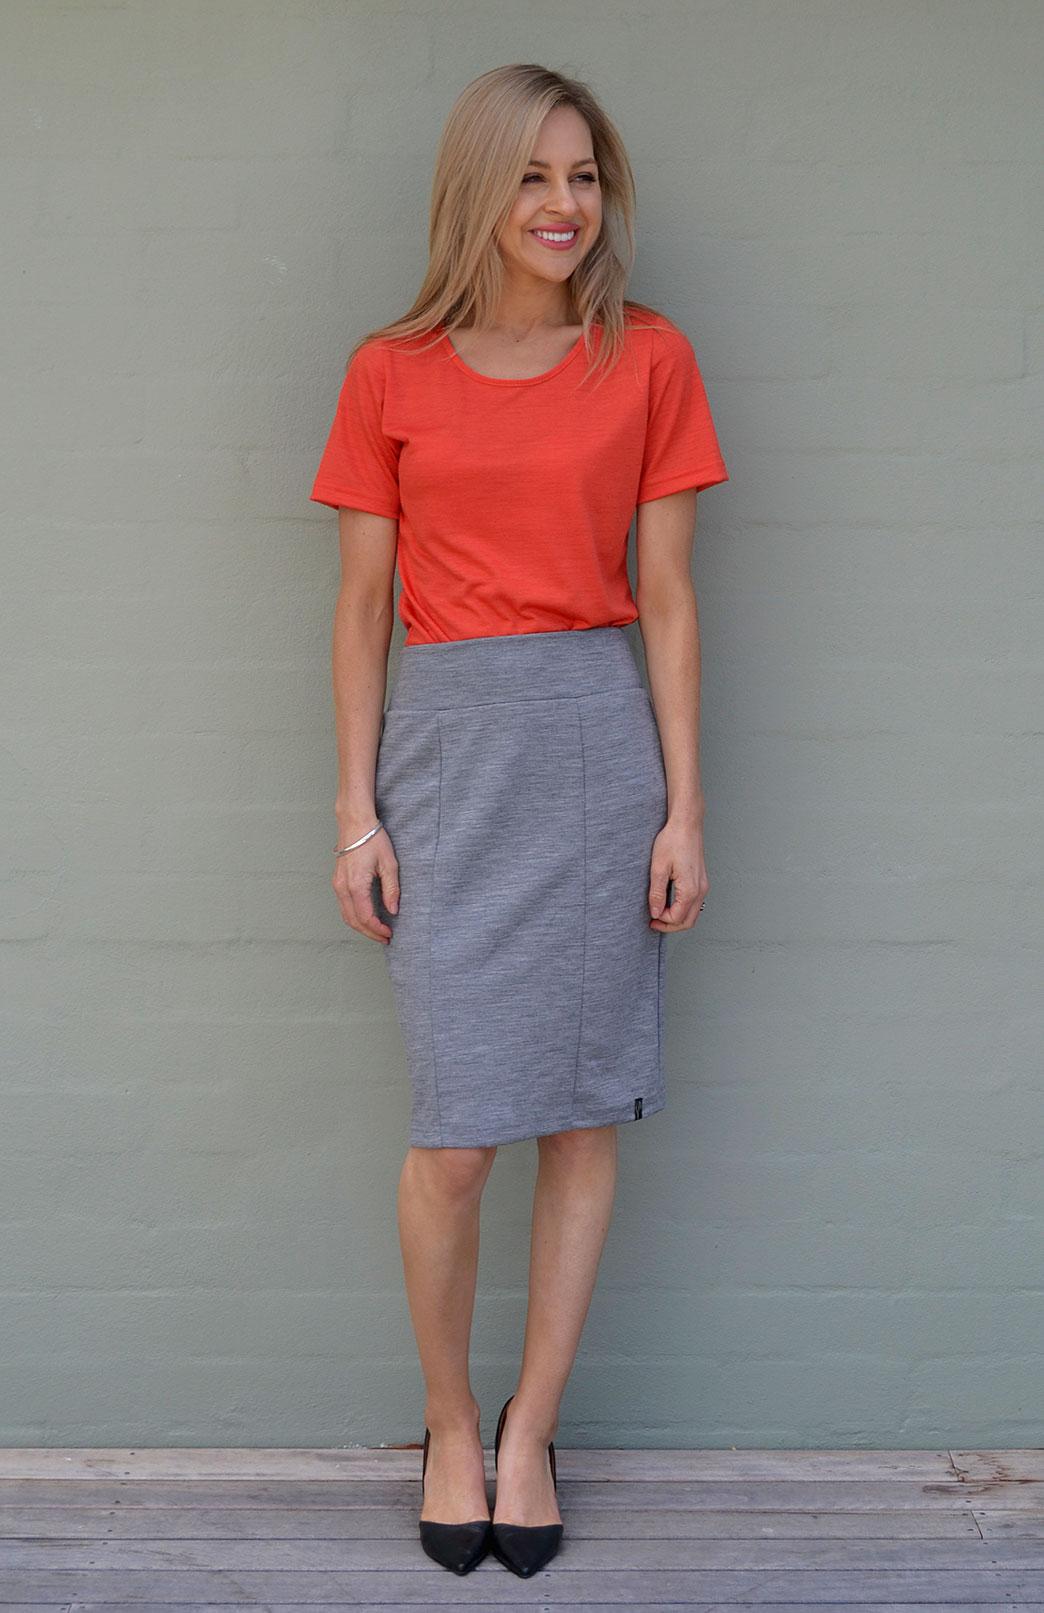 Rubie Top - Women's Pure Merino Wool Paprika Orange Short Sleeved Round Neck Top - Smitten Merino Tasmania Australia